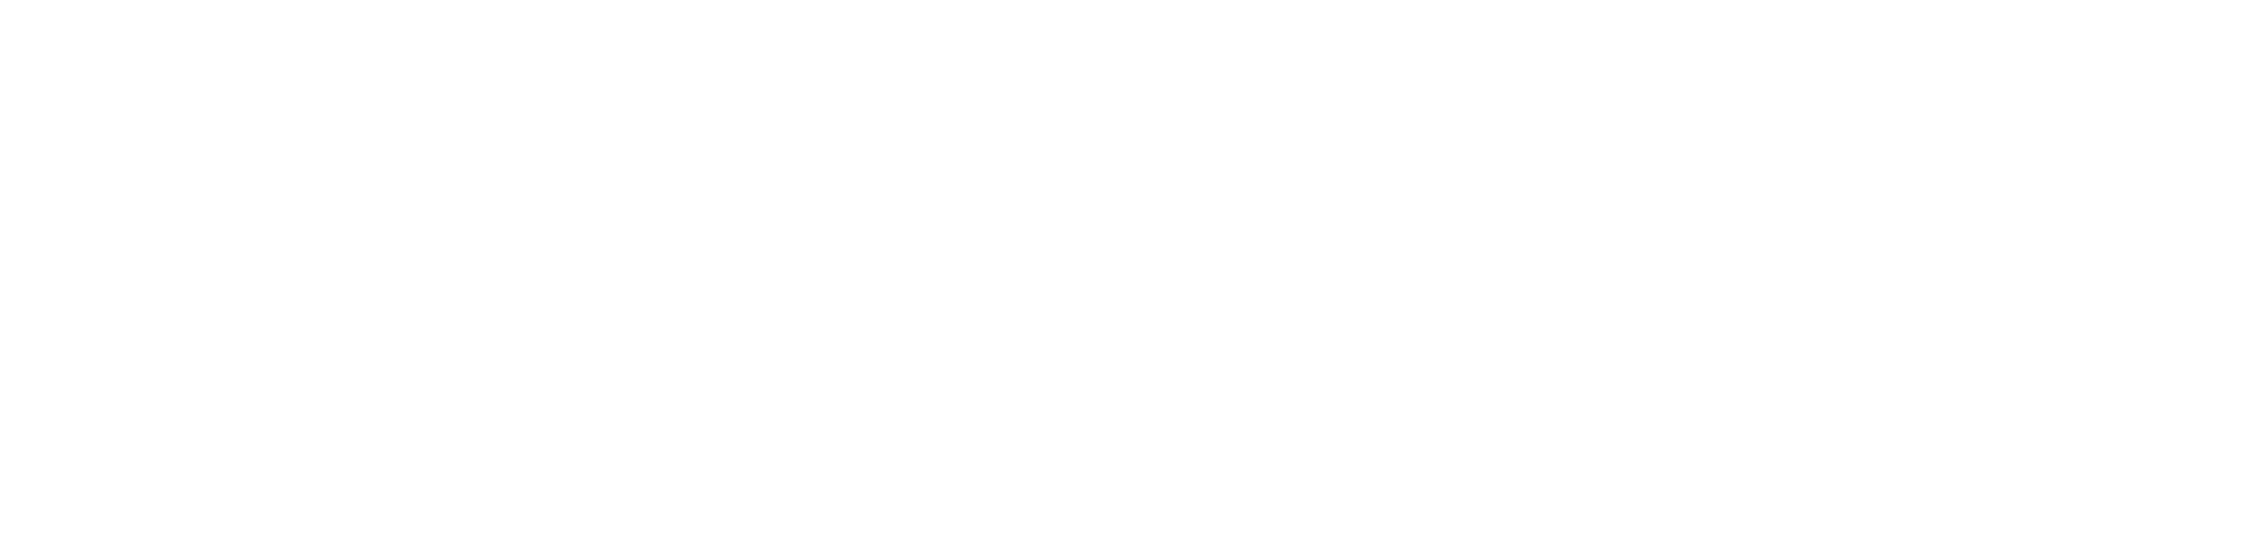 INTERFÉRENCE PRESS